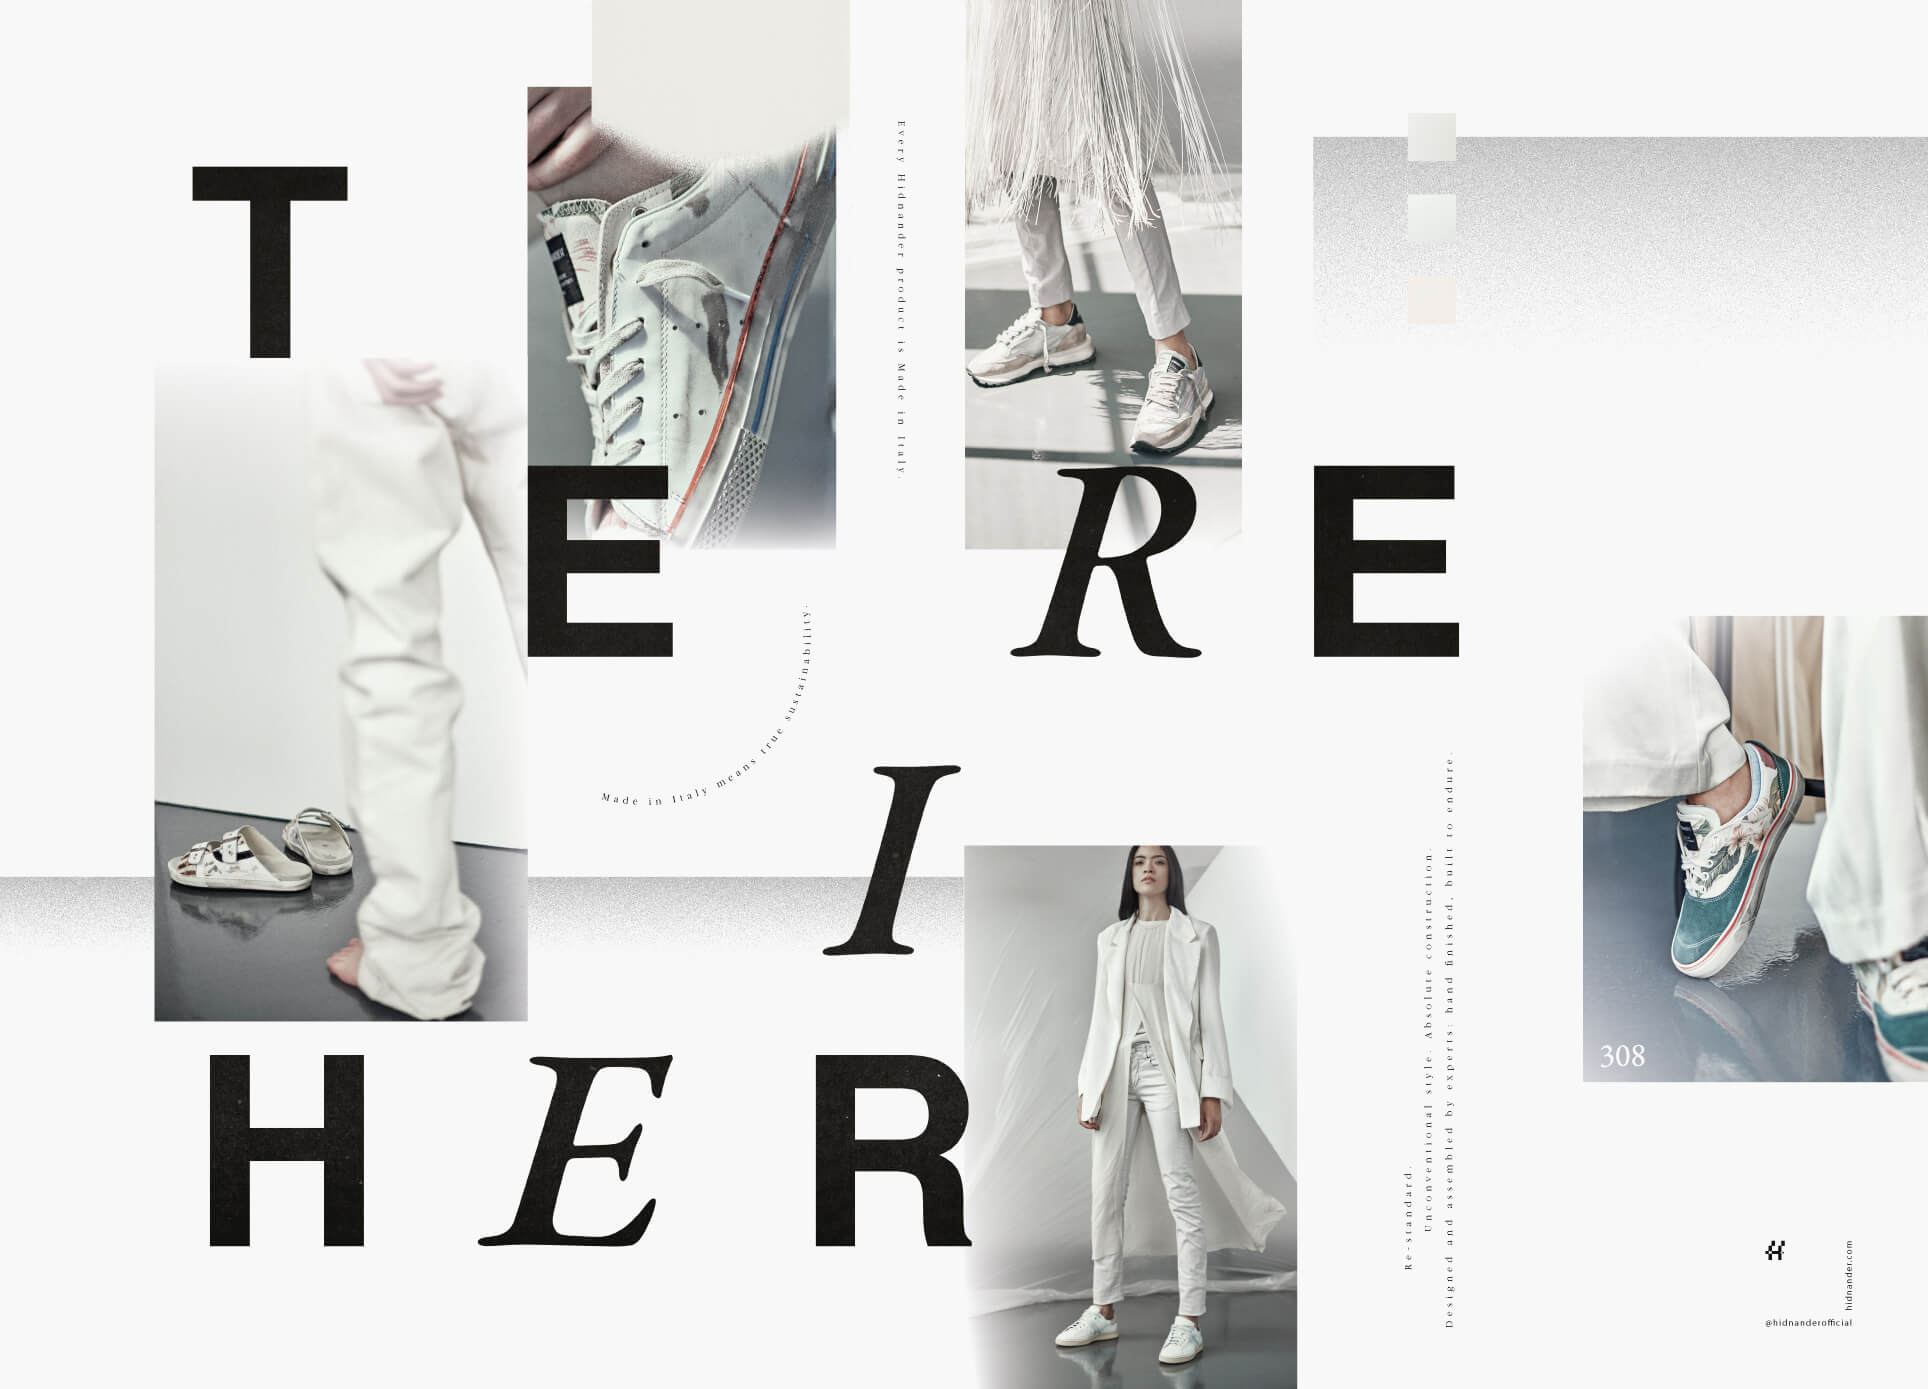 Hidnander-Poster-SS21-The-wearer-is-Hero_F